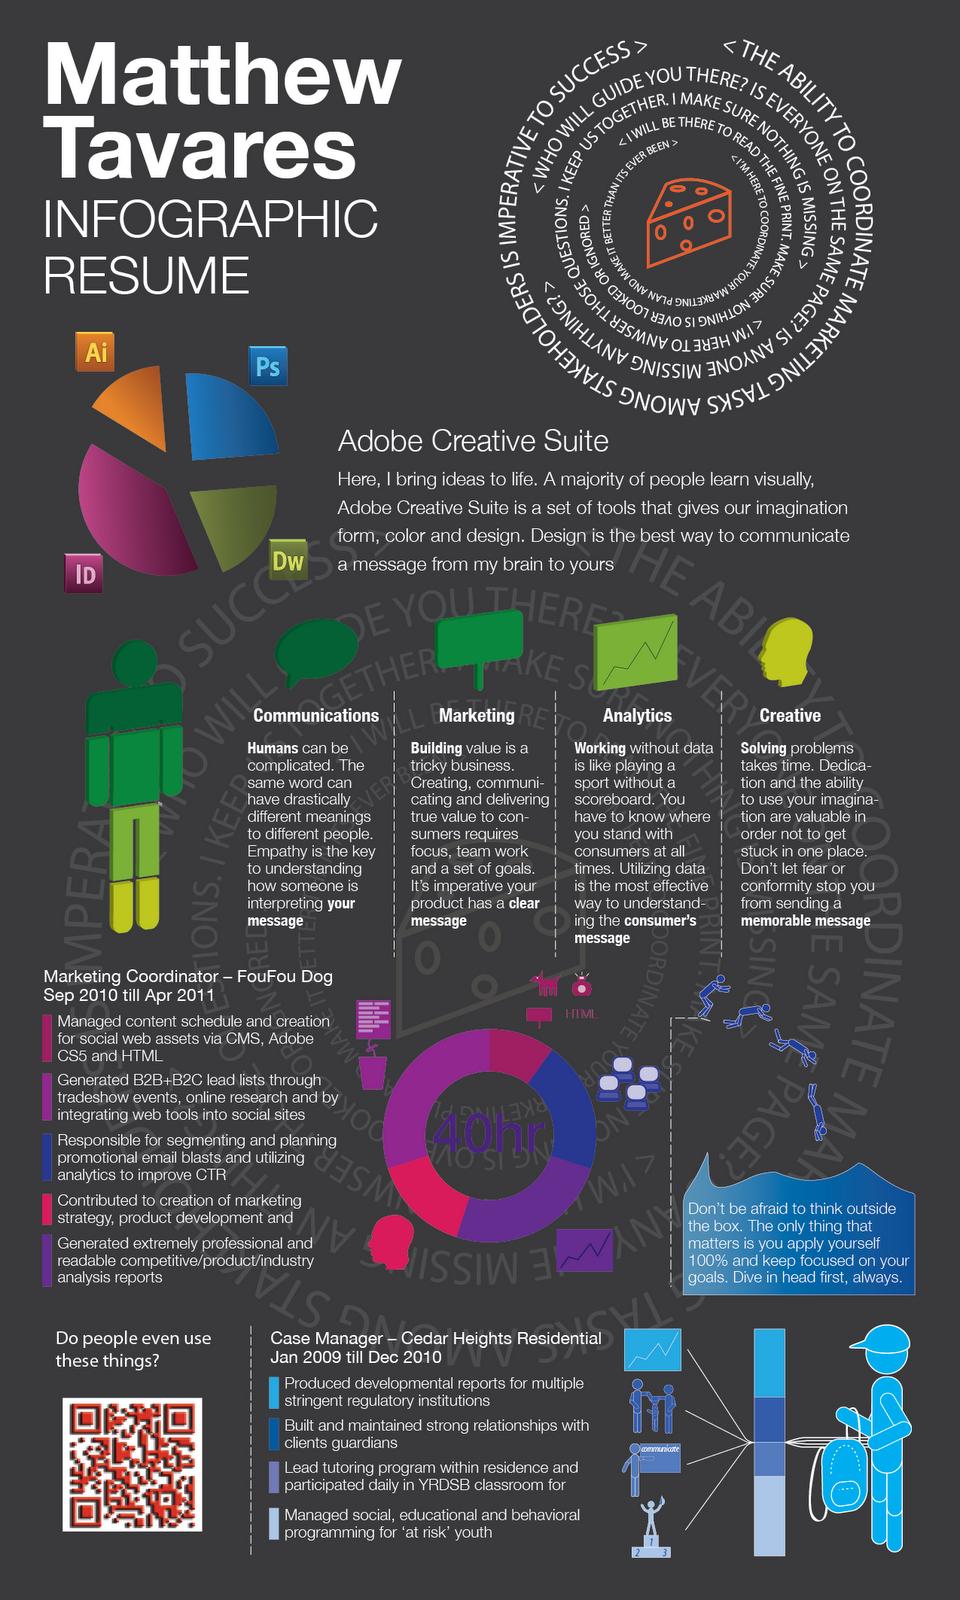 La Coctelera Visual 50 Cv Infograficos Cool Infographic Resumes